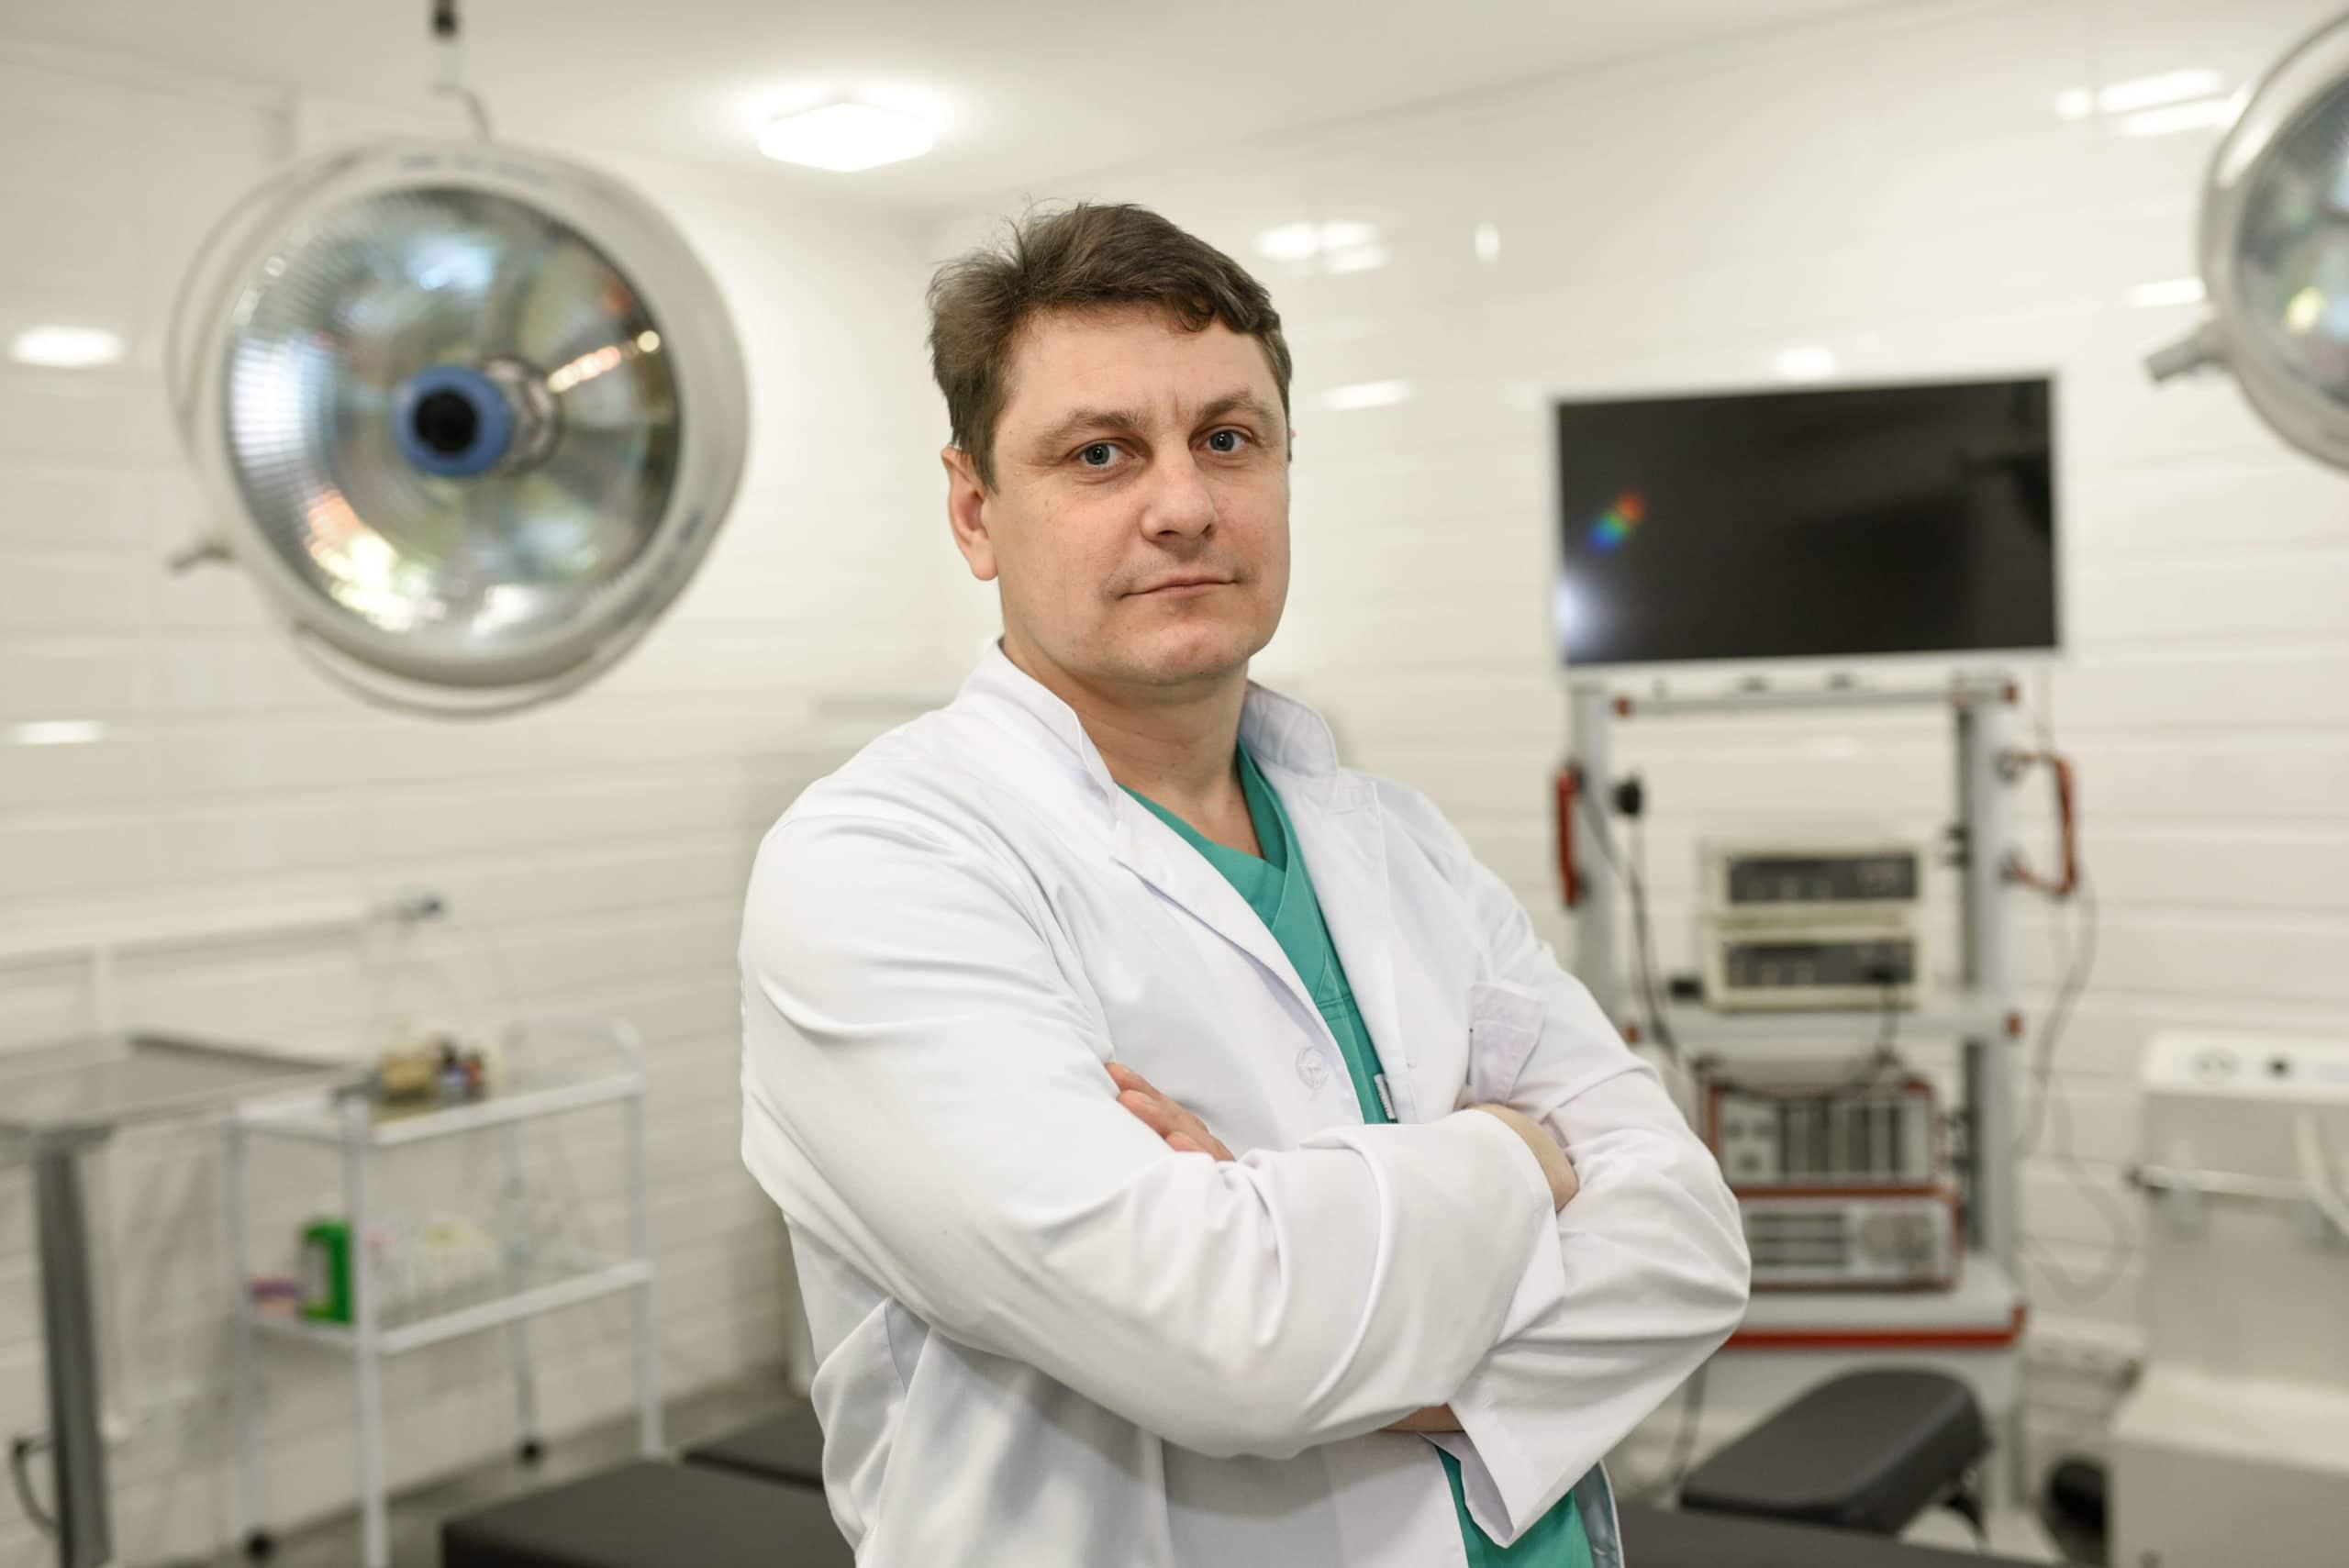 Волошин Олег Михайлович